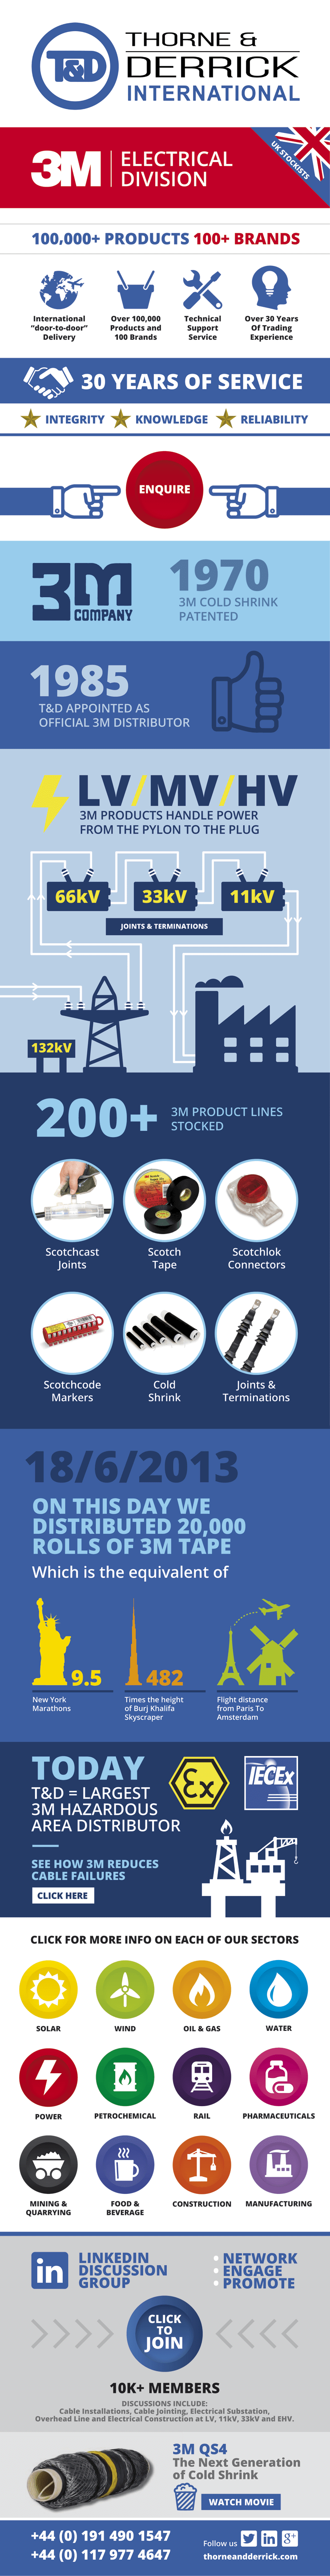 3M Infographic